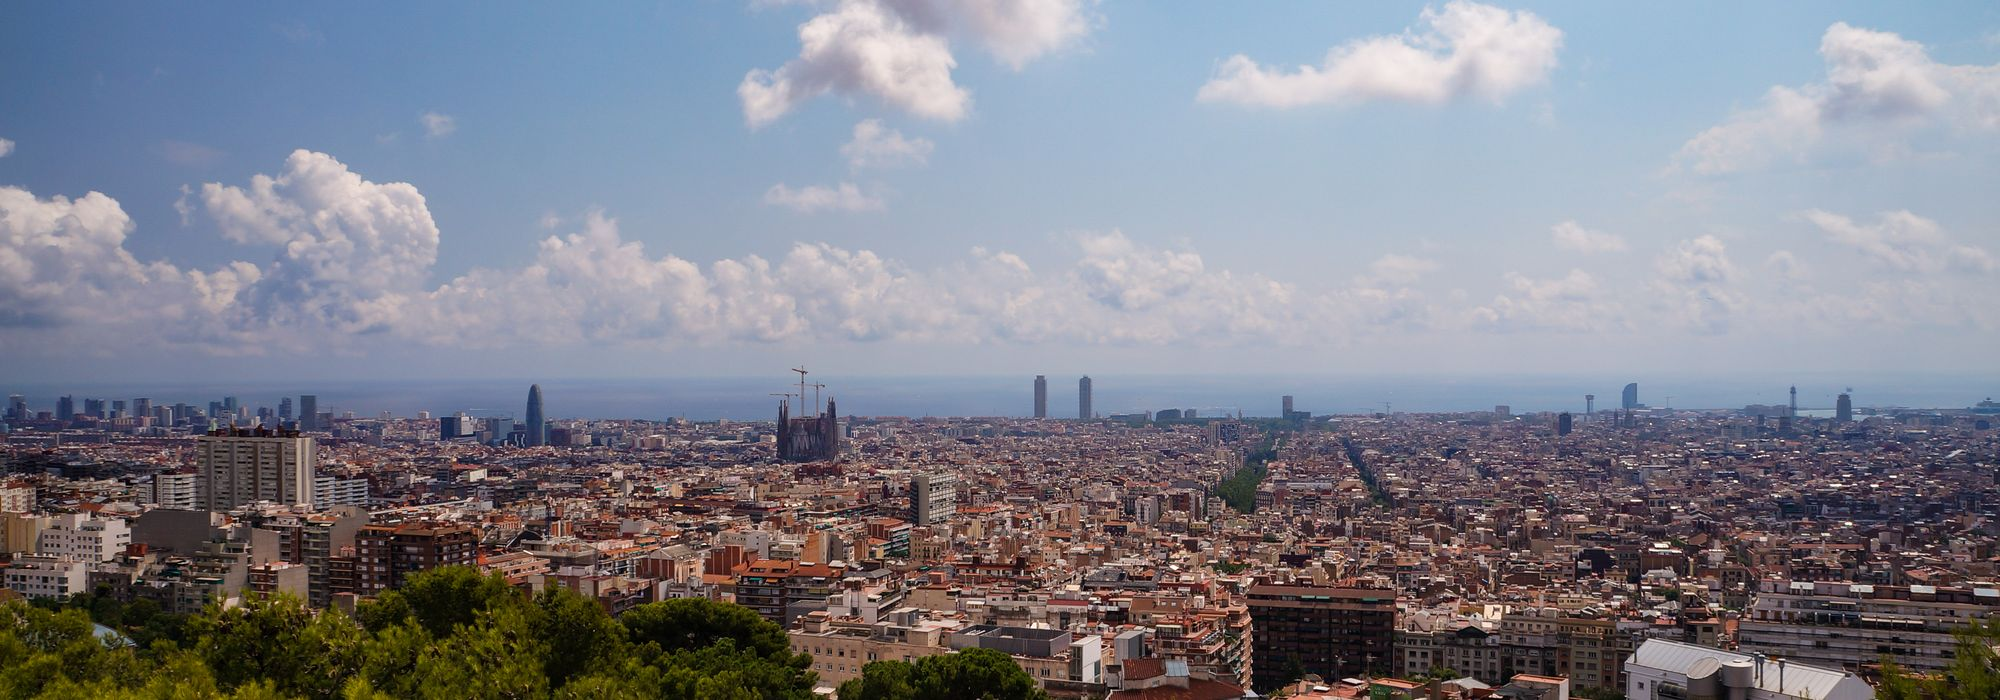 Barcelona city centre